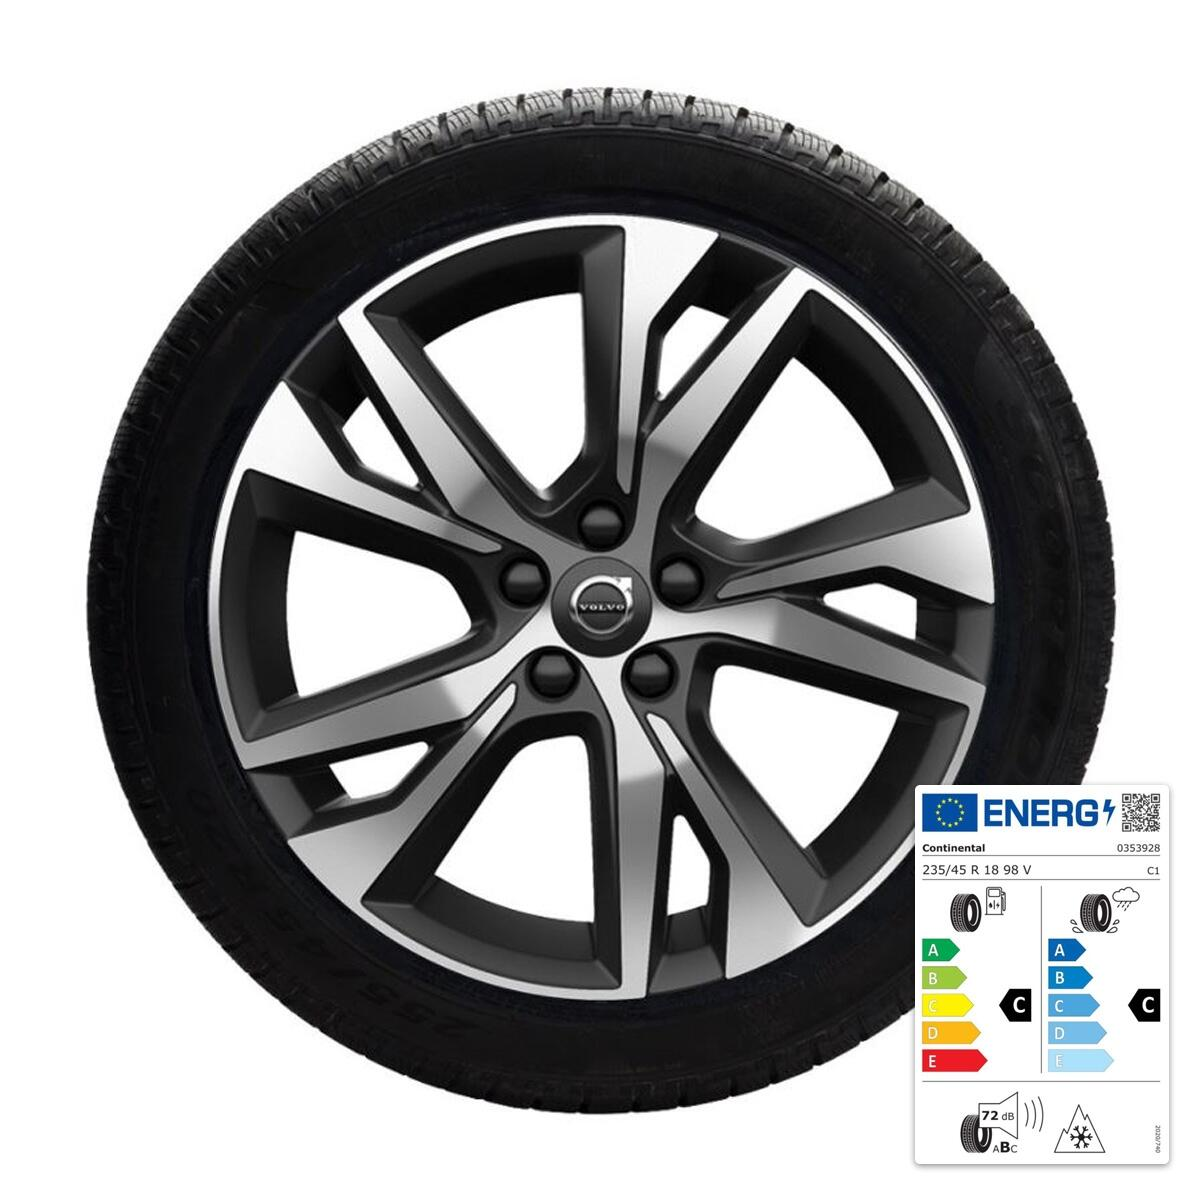 "Komplet zimskih koles:  45,70 cm 18"", pnevmatike  Continental"